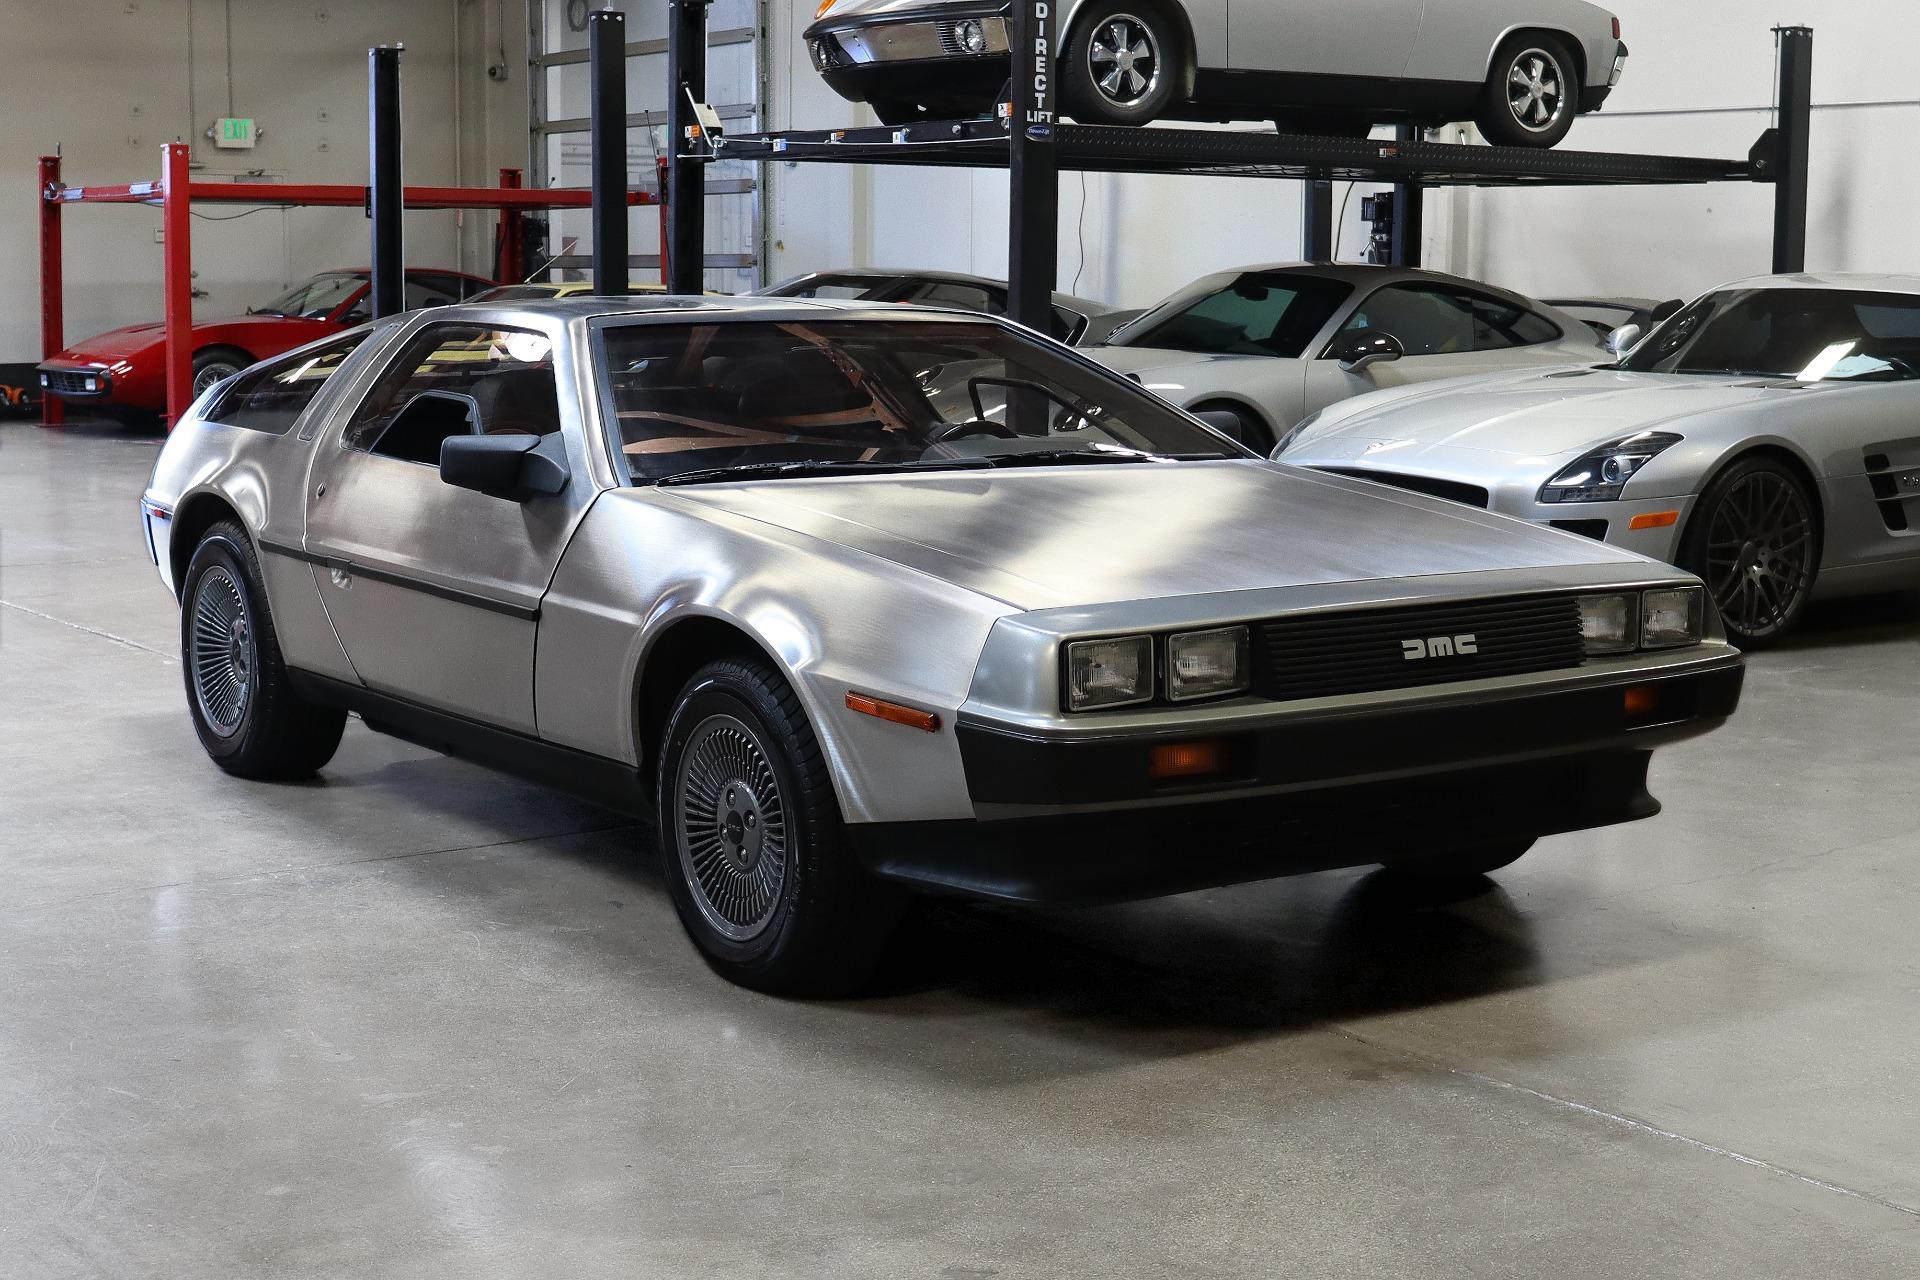 Used 1981 DeLorean DMC-12 for sale Sold at San Francisco Sports Cars in San Carlos CA 94070 1